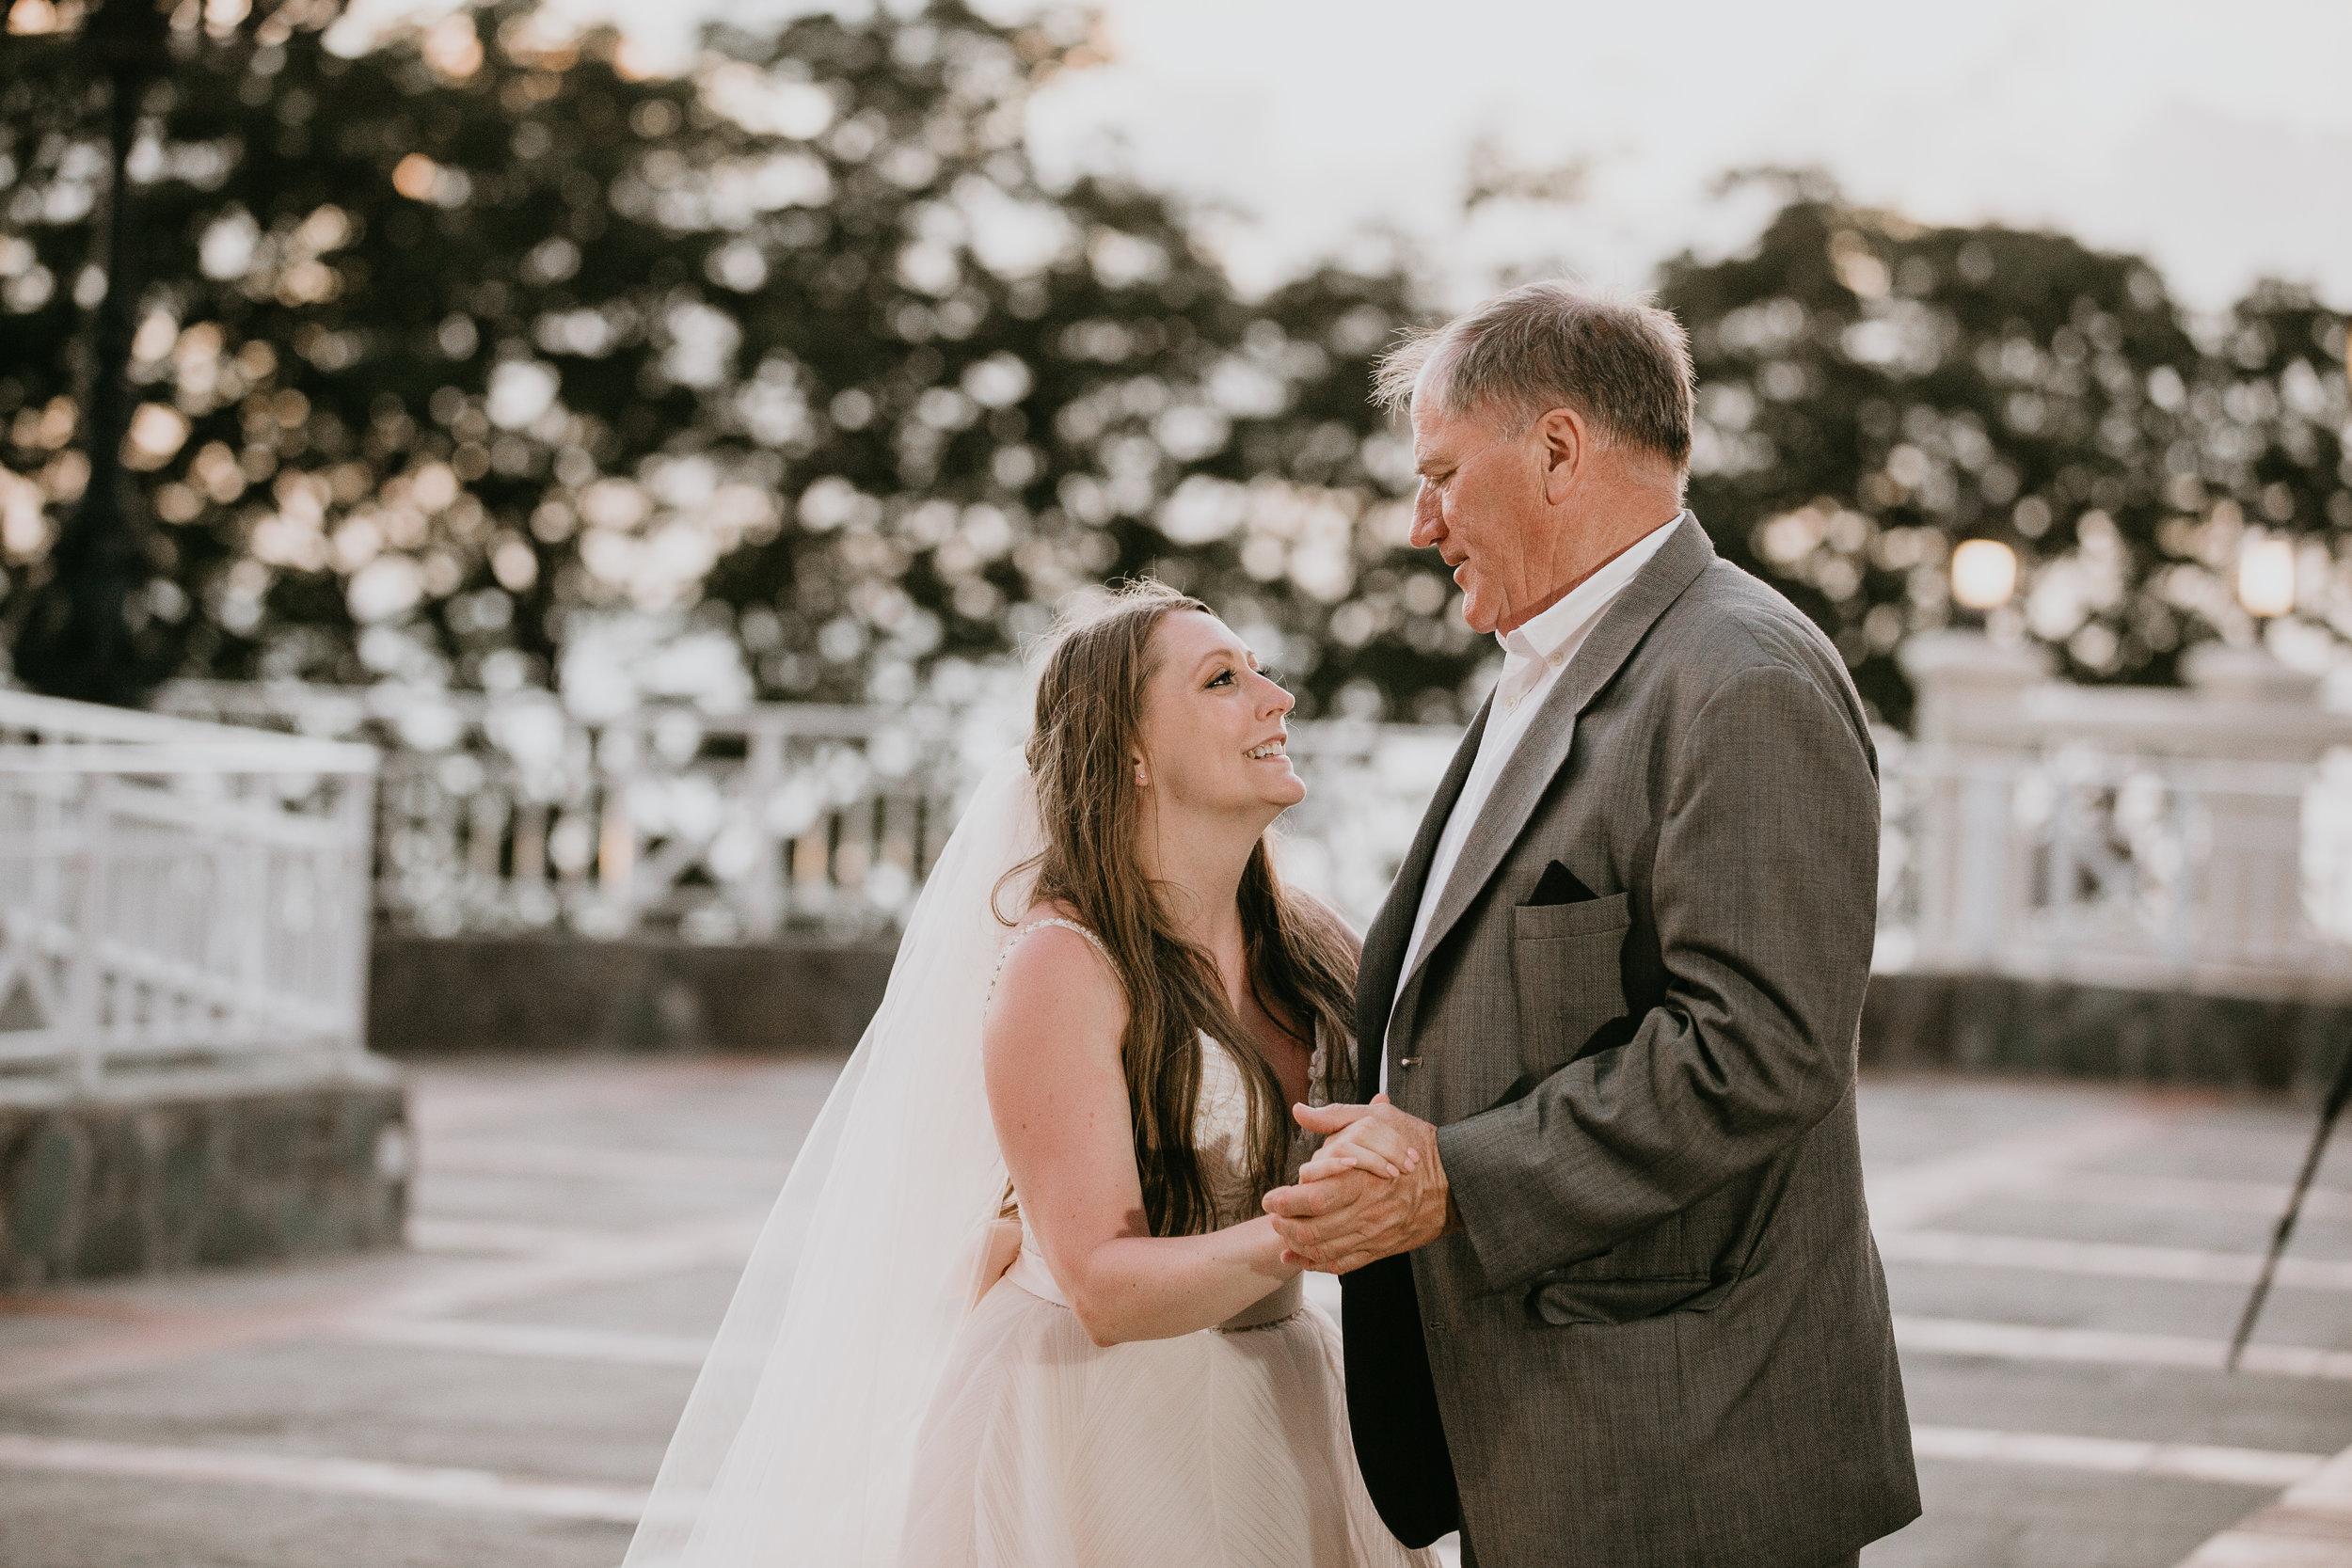 nicole-daacke-photography-destination-wedding-in-st-lucia-sandals-la-toc-intimate-island-wedding-carribean-elopement-photographer-chill-island-wedding-142.jpg